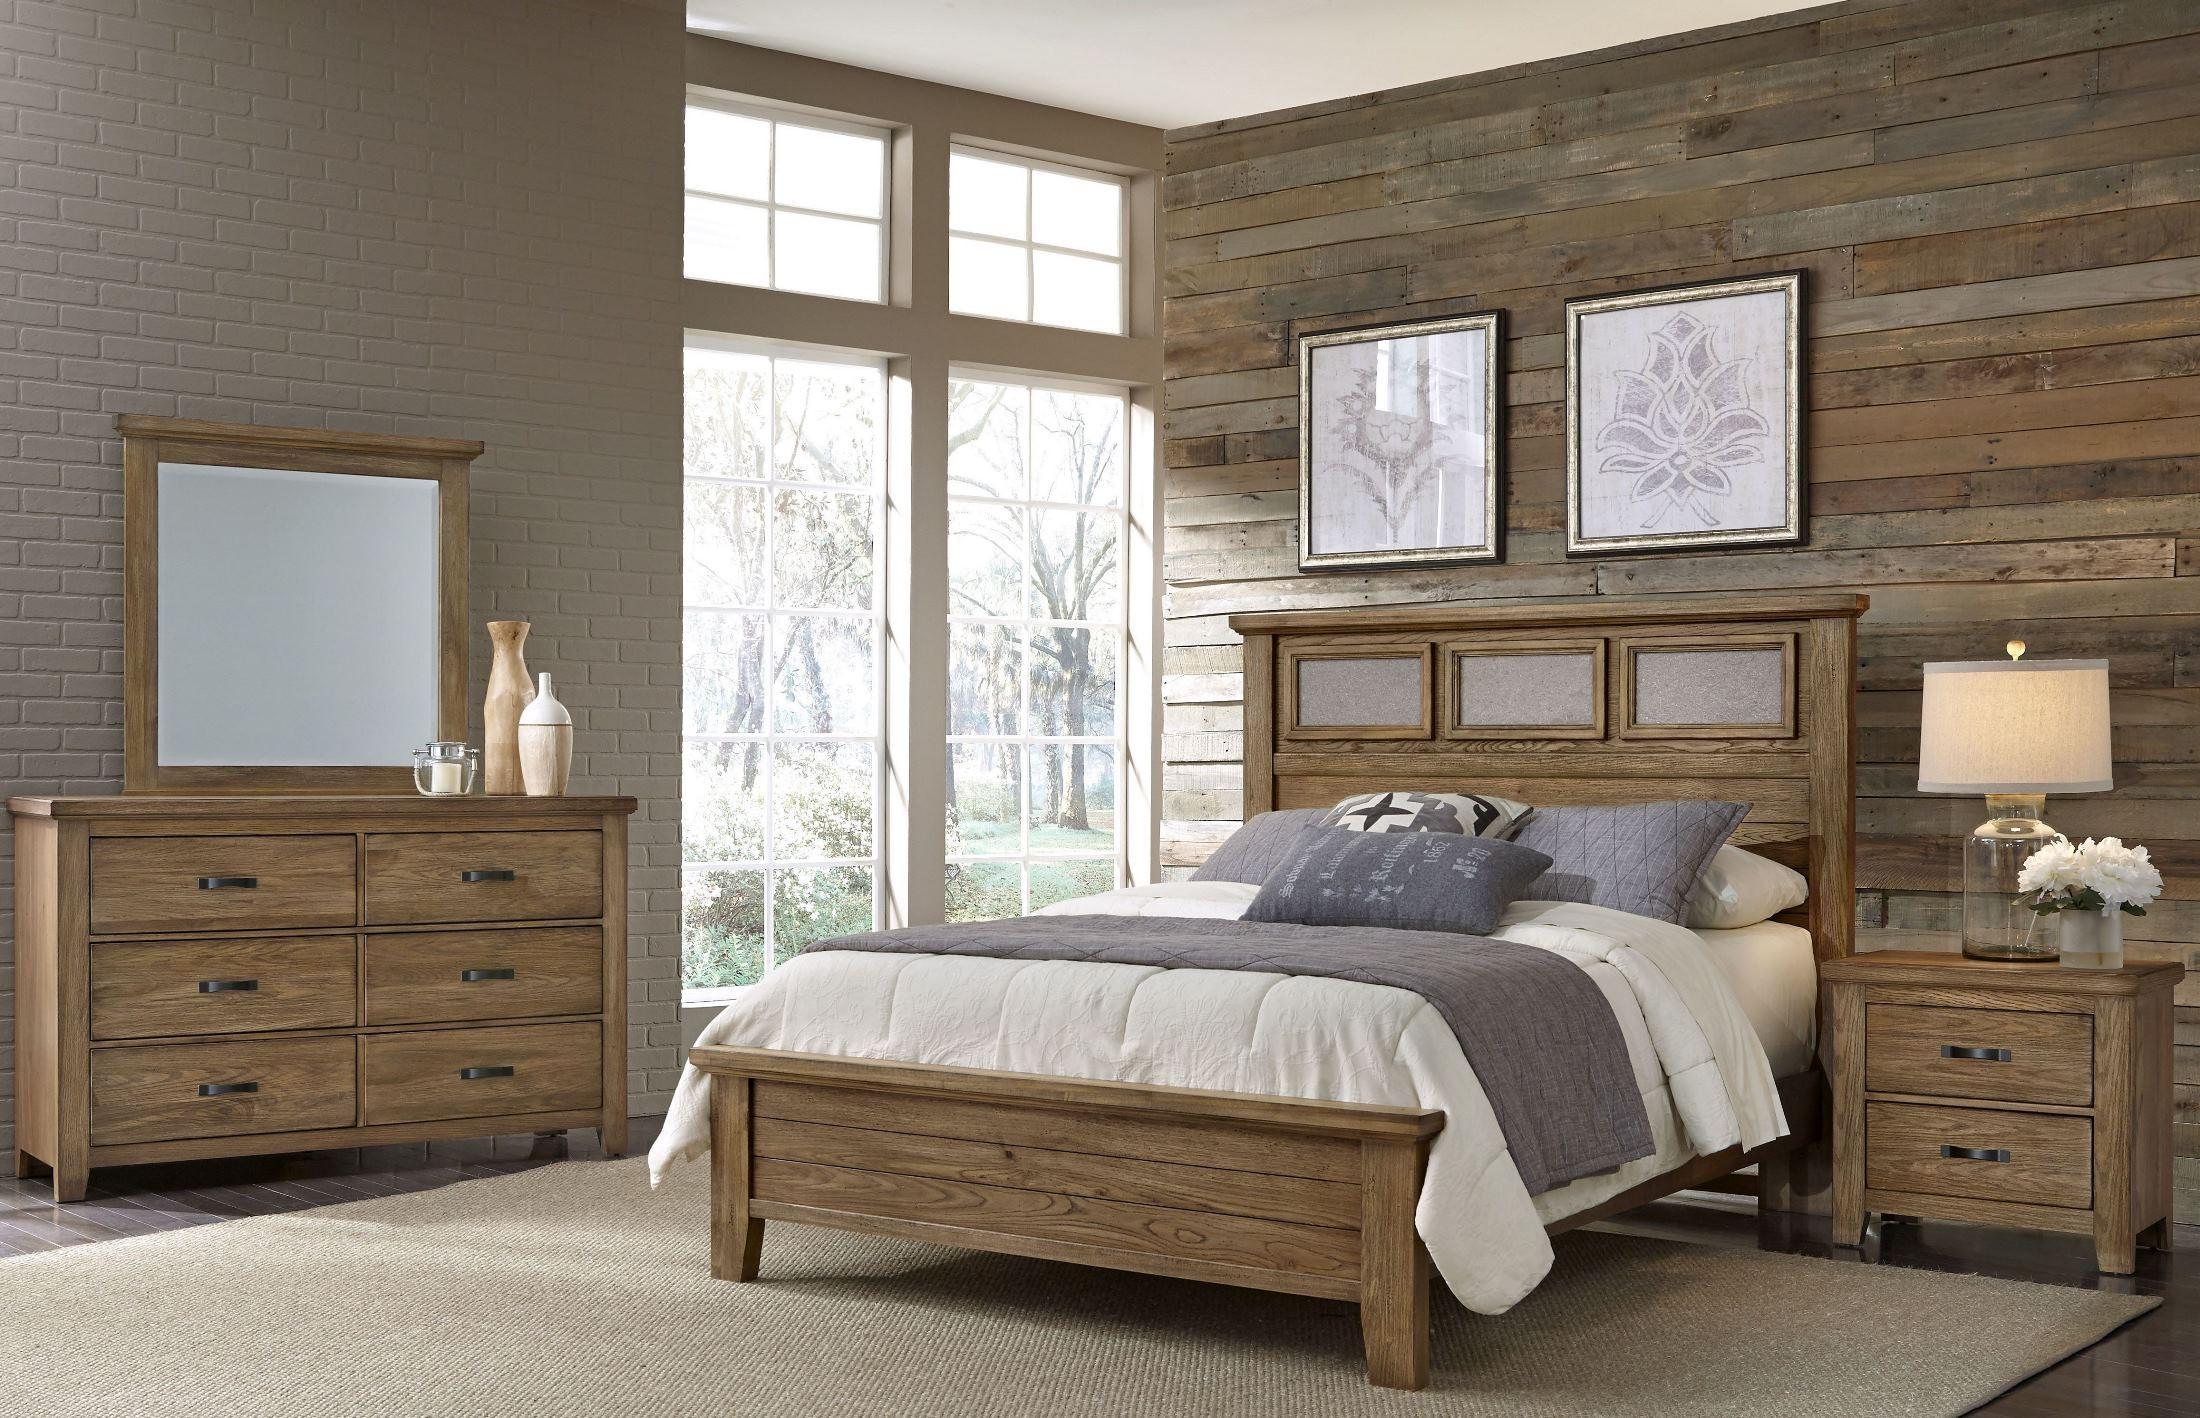 Cassel park natural tile bedroom set from virginia house